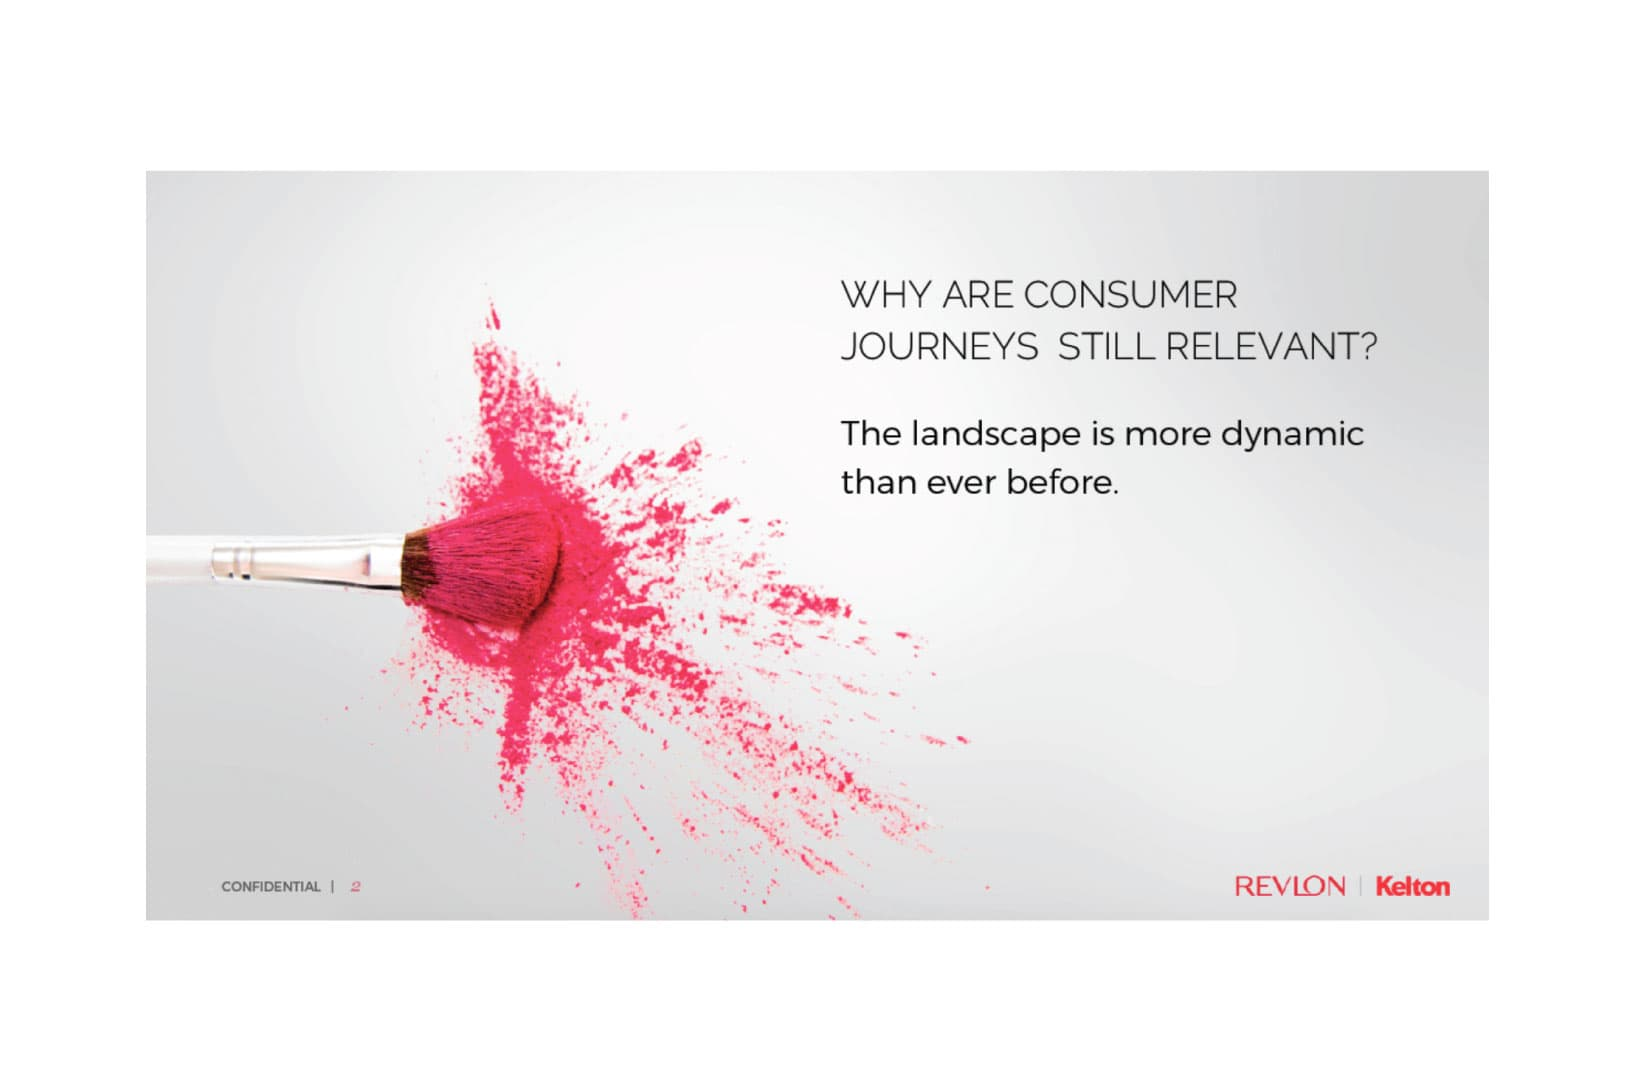 Revlon case study market research